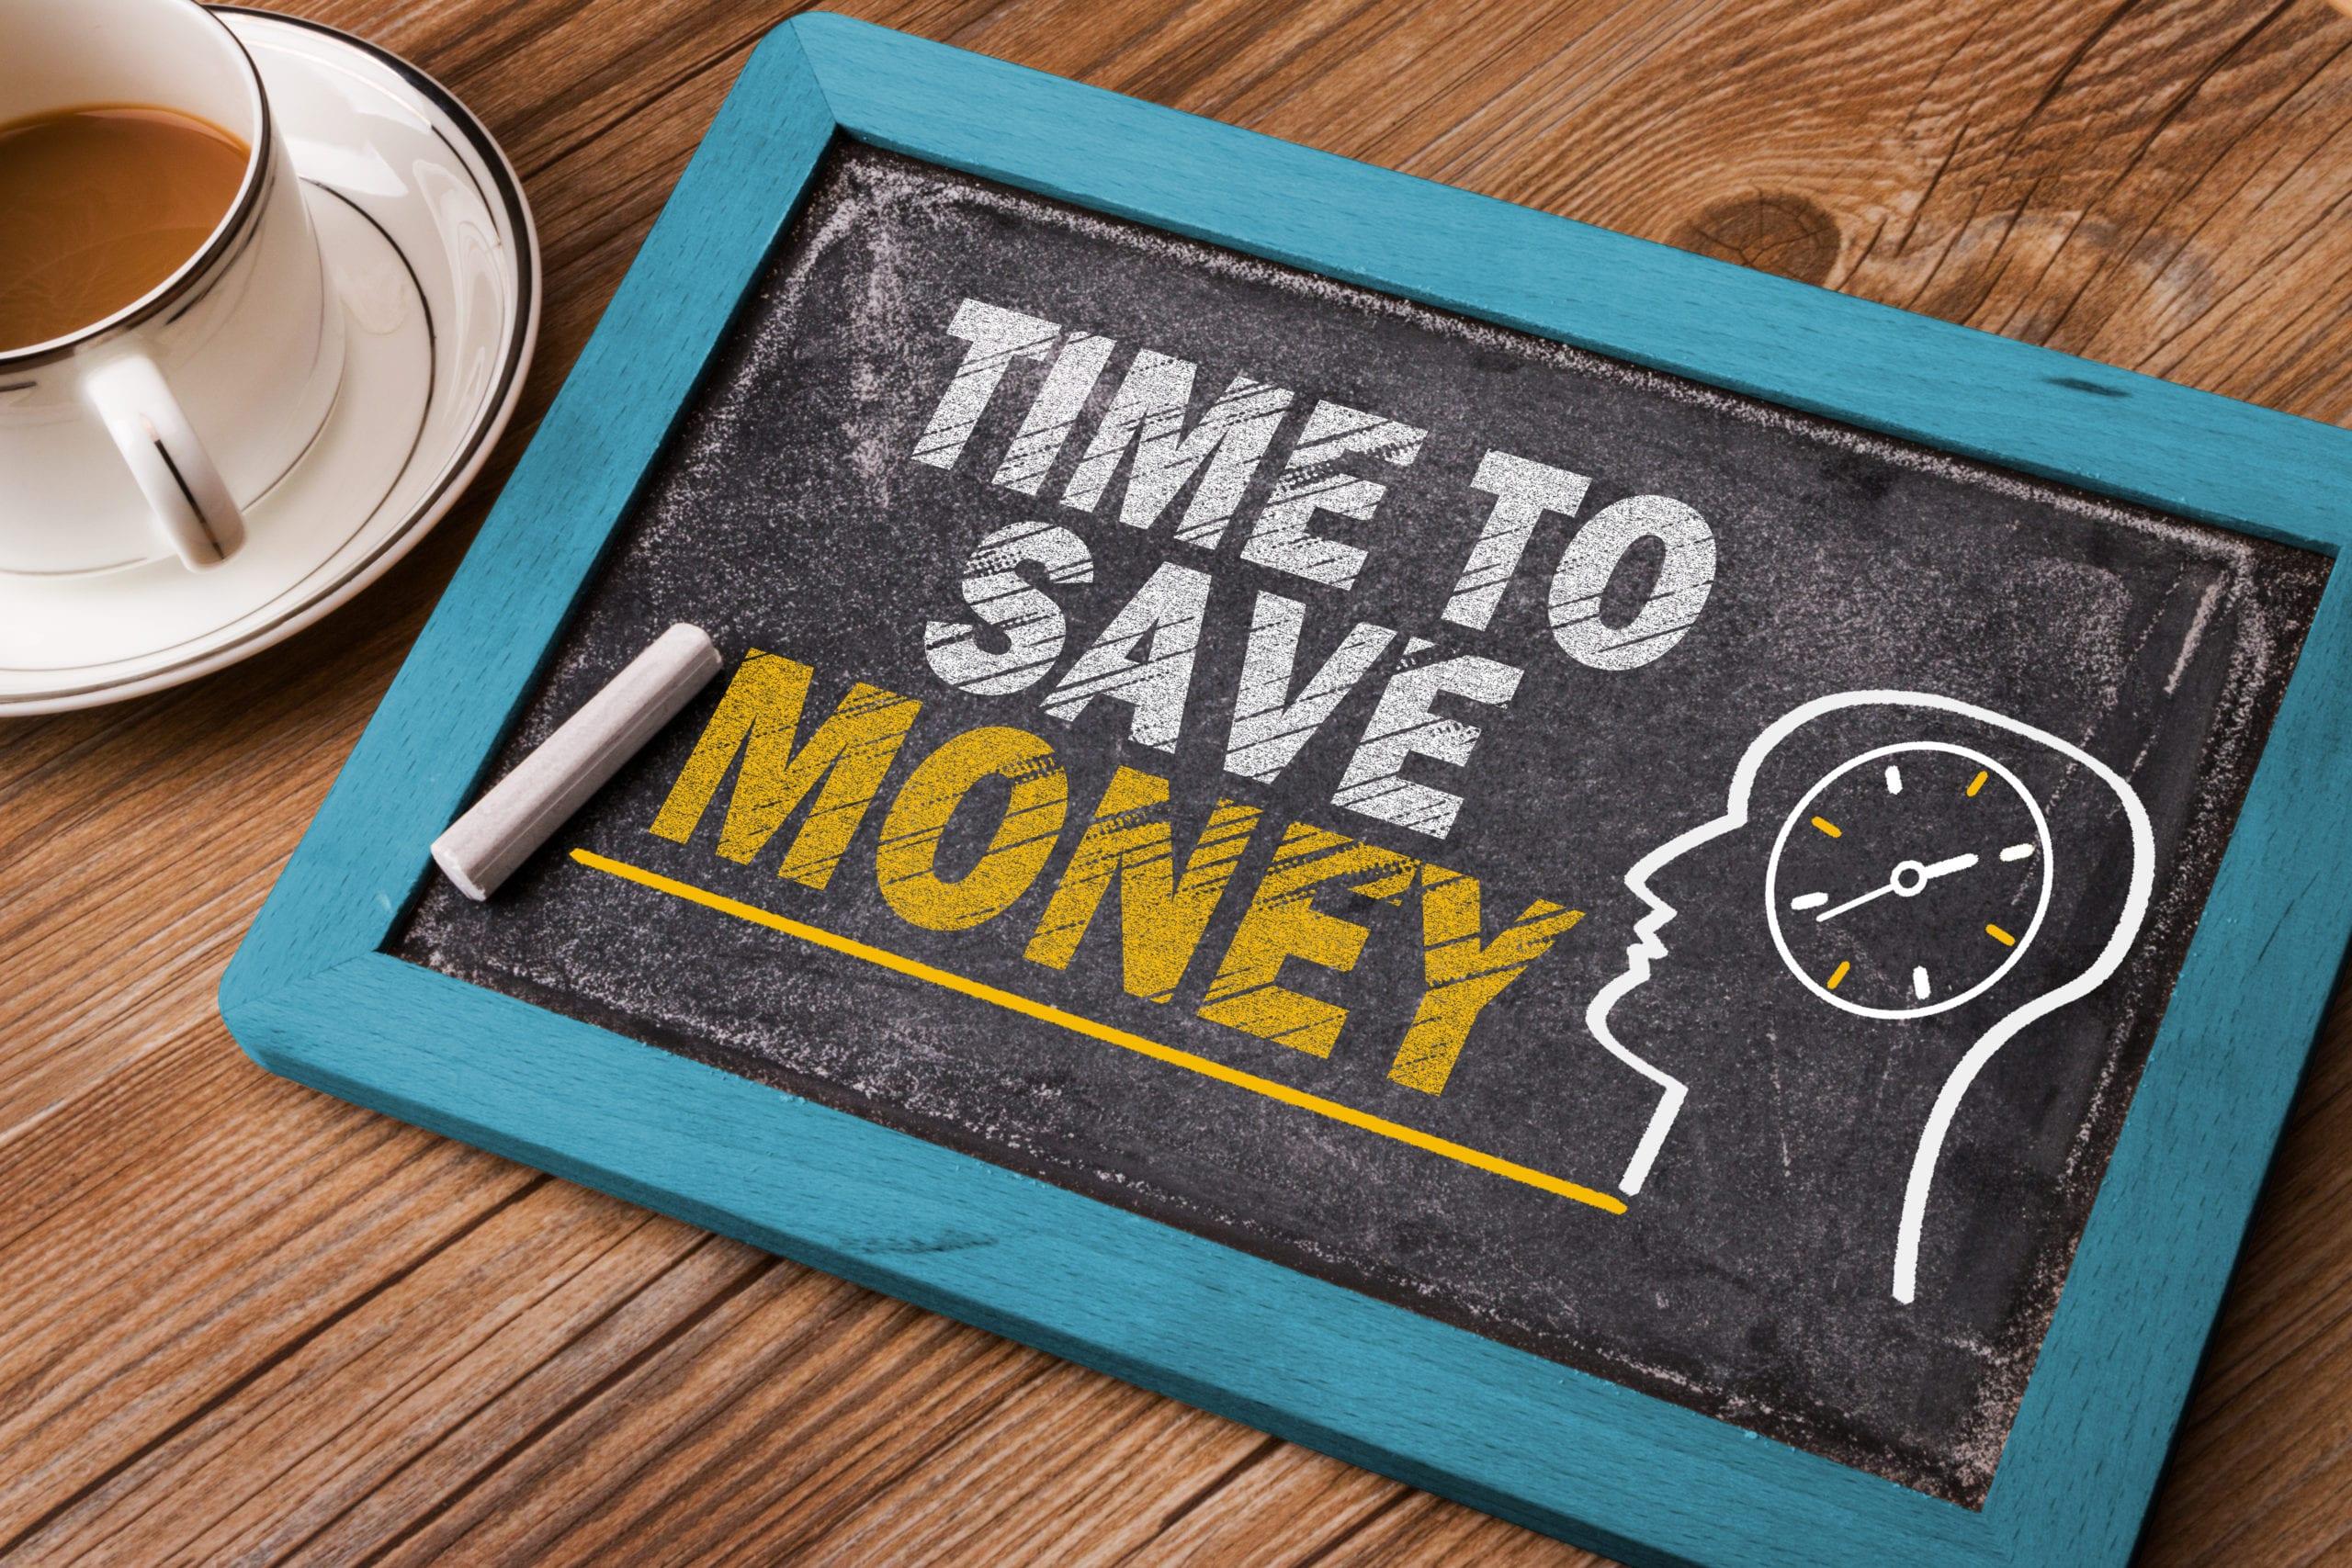 Hip2Save, Hip2Save.com. Save money. Coupons. Save cash. Moner-saving. Budget-friendly.